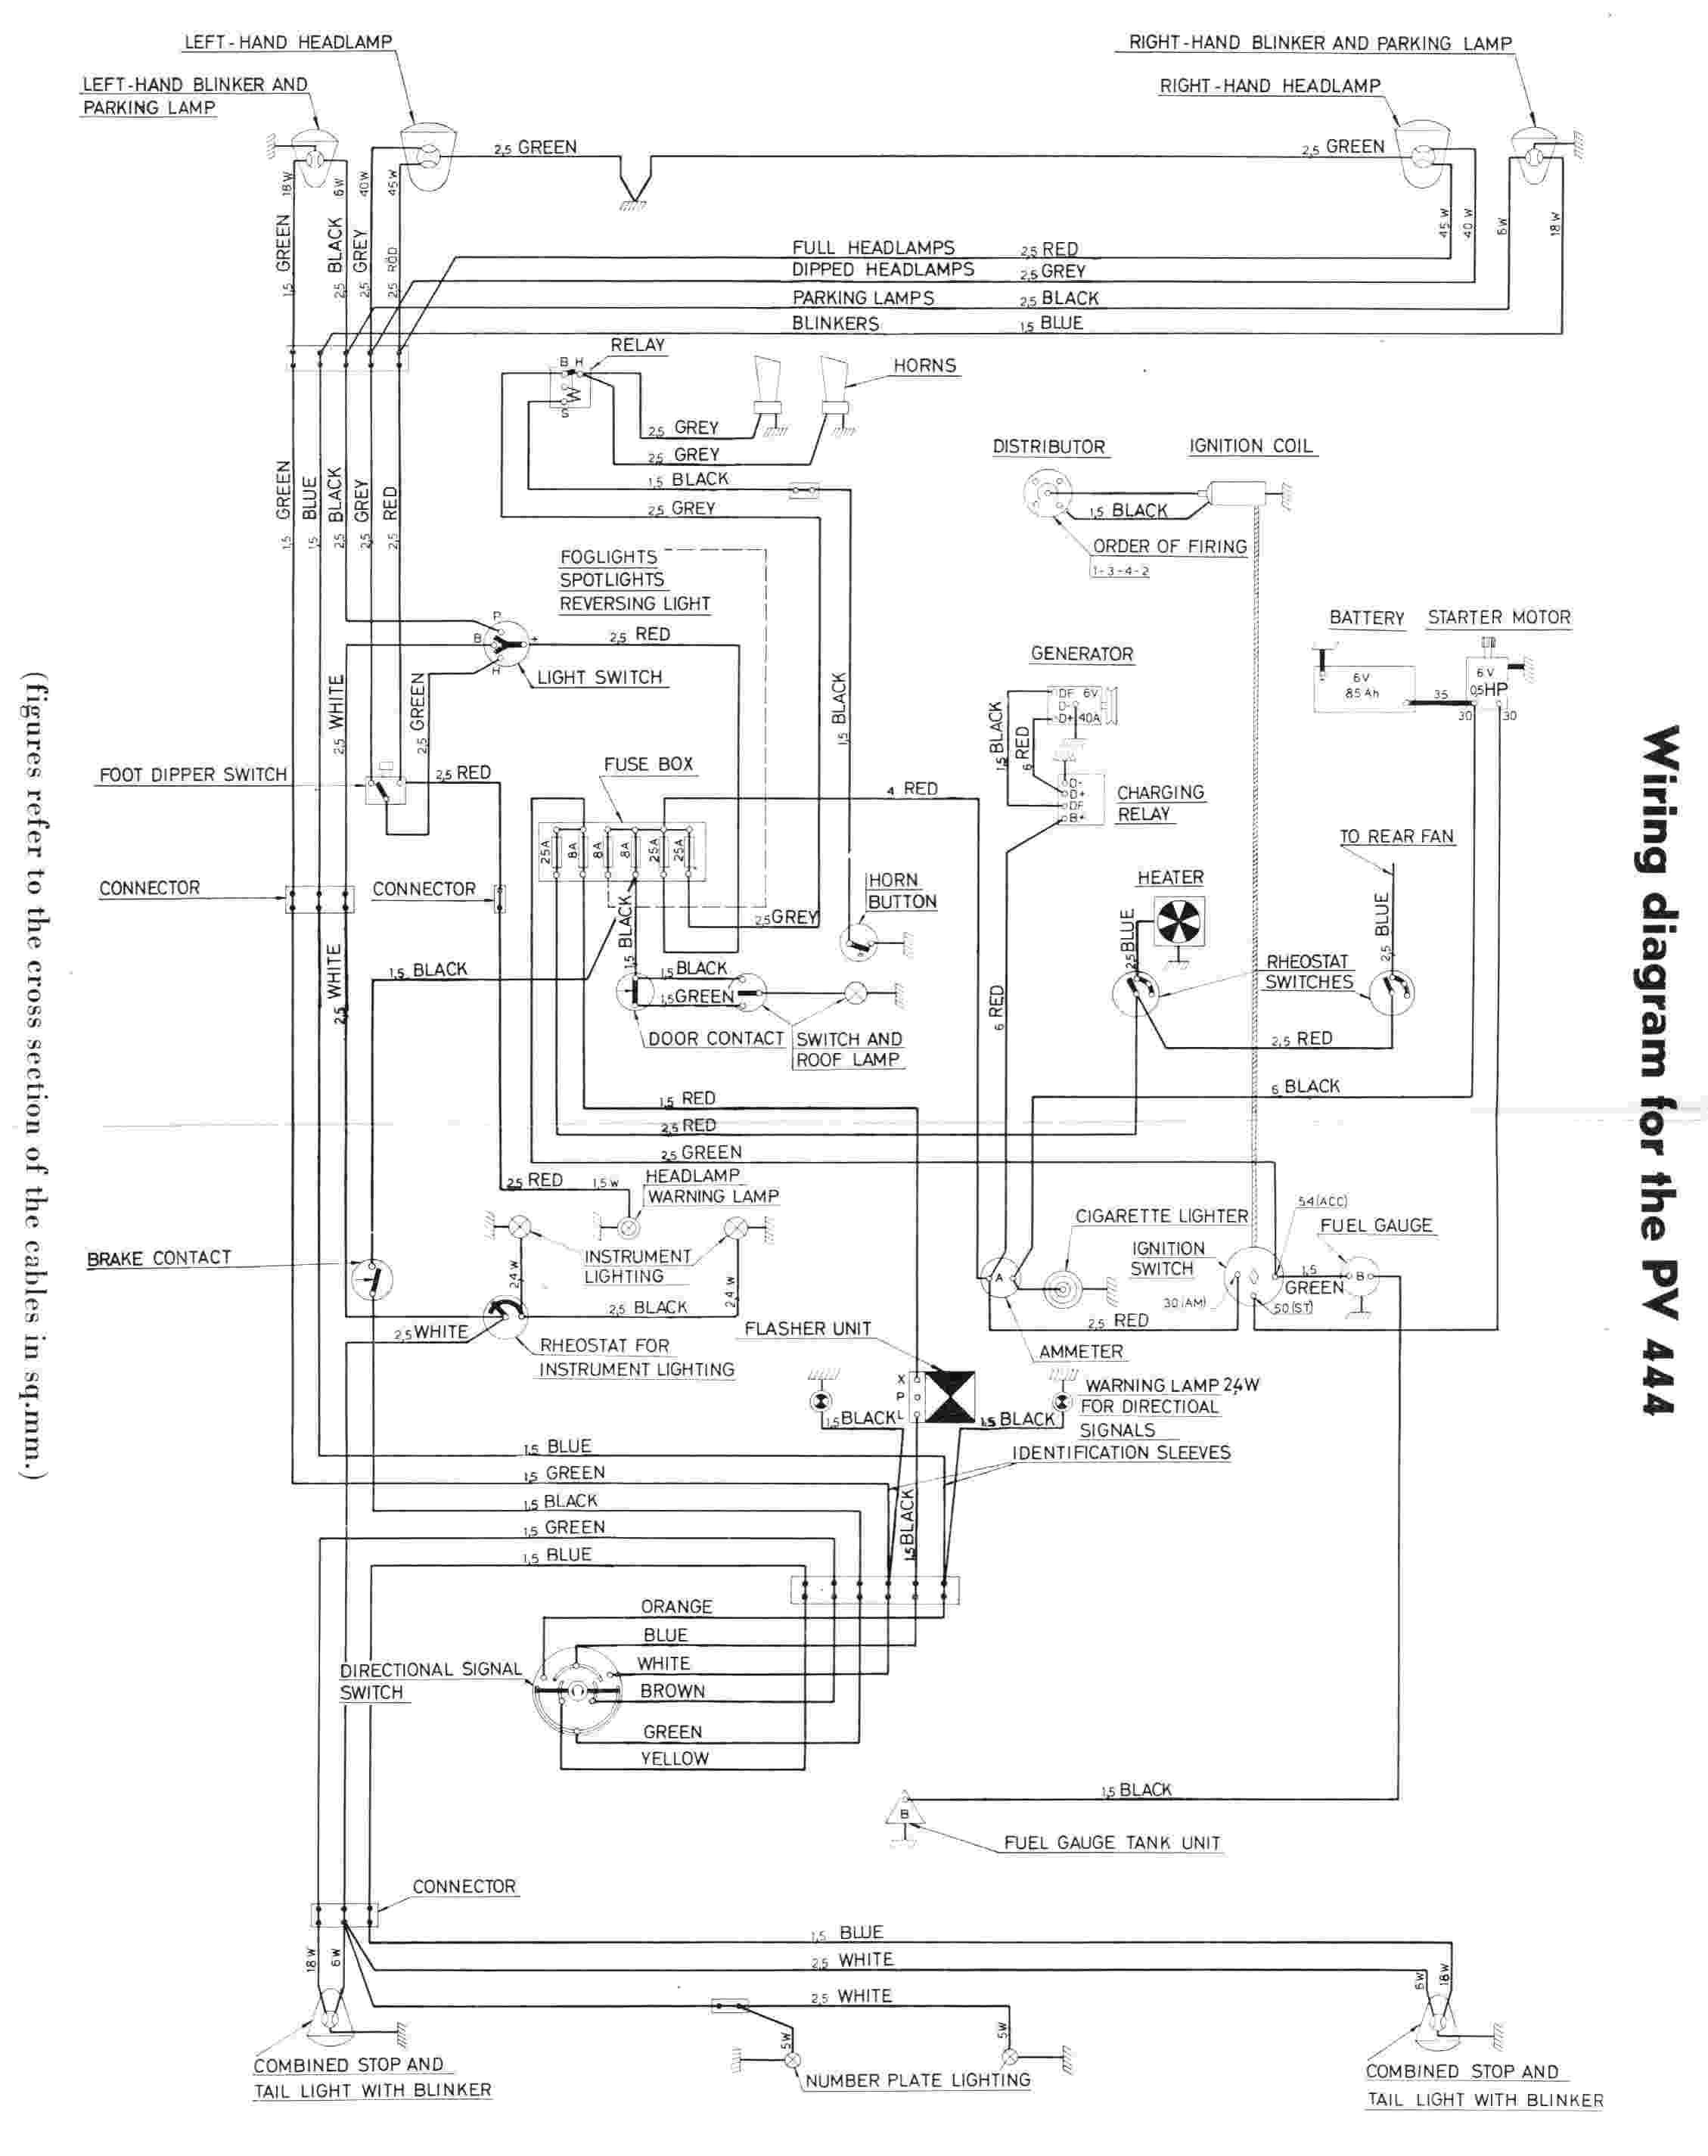 hight resolution of juki ac wiring 240 10 11 manualuniverse co u2022240 ac wiring schematic diagram rh 10